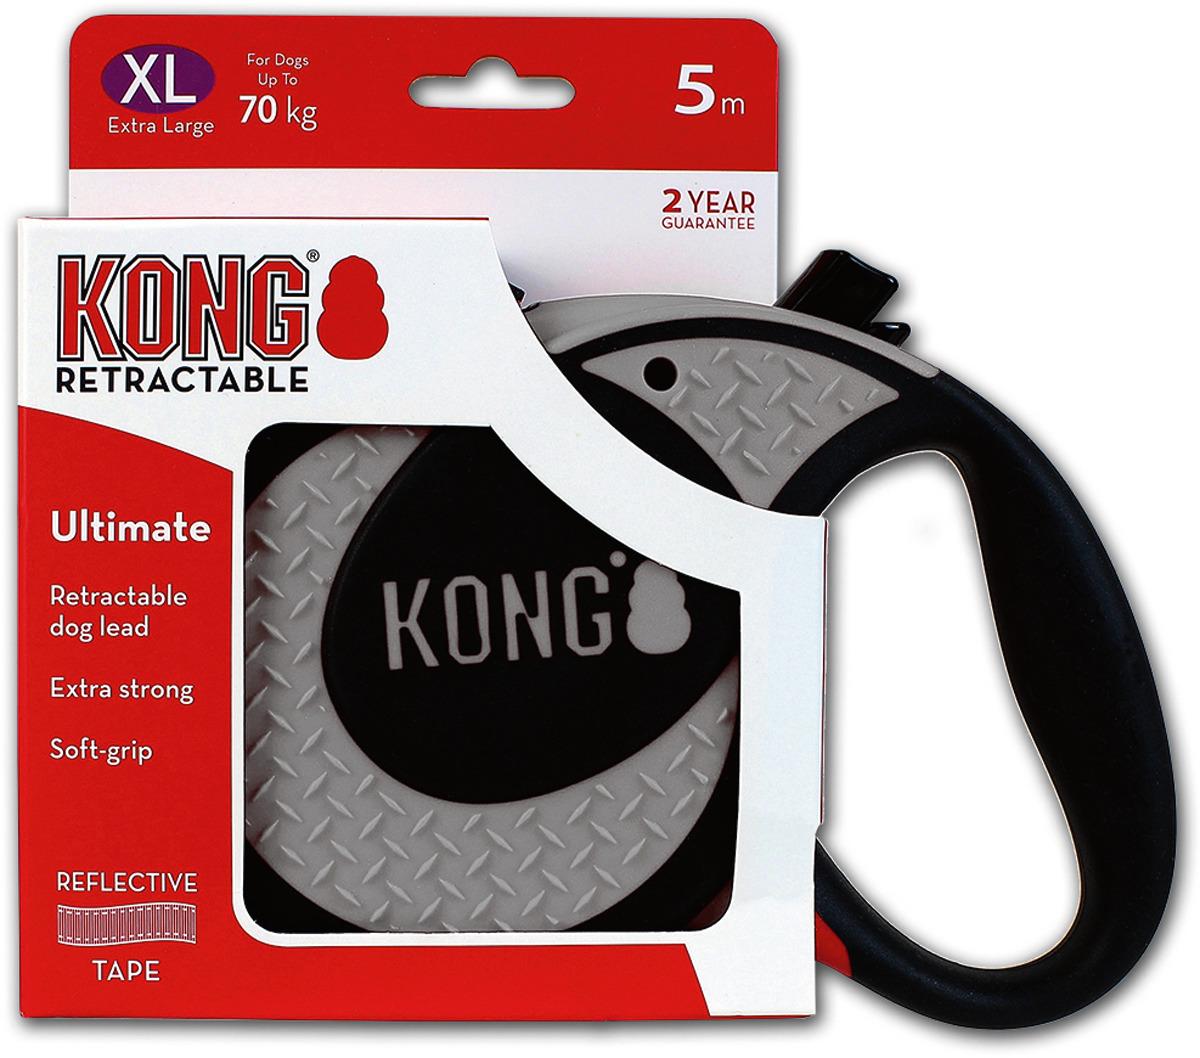 Поводок-рулетка для собак Kong Ultimate XL, цвет: серый, до 70 кг, 5 м